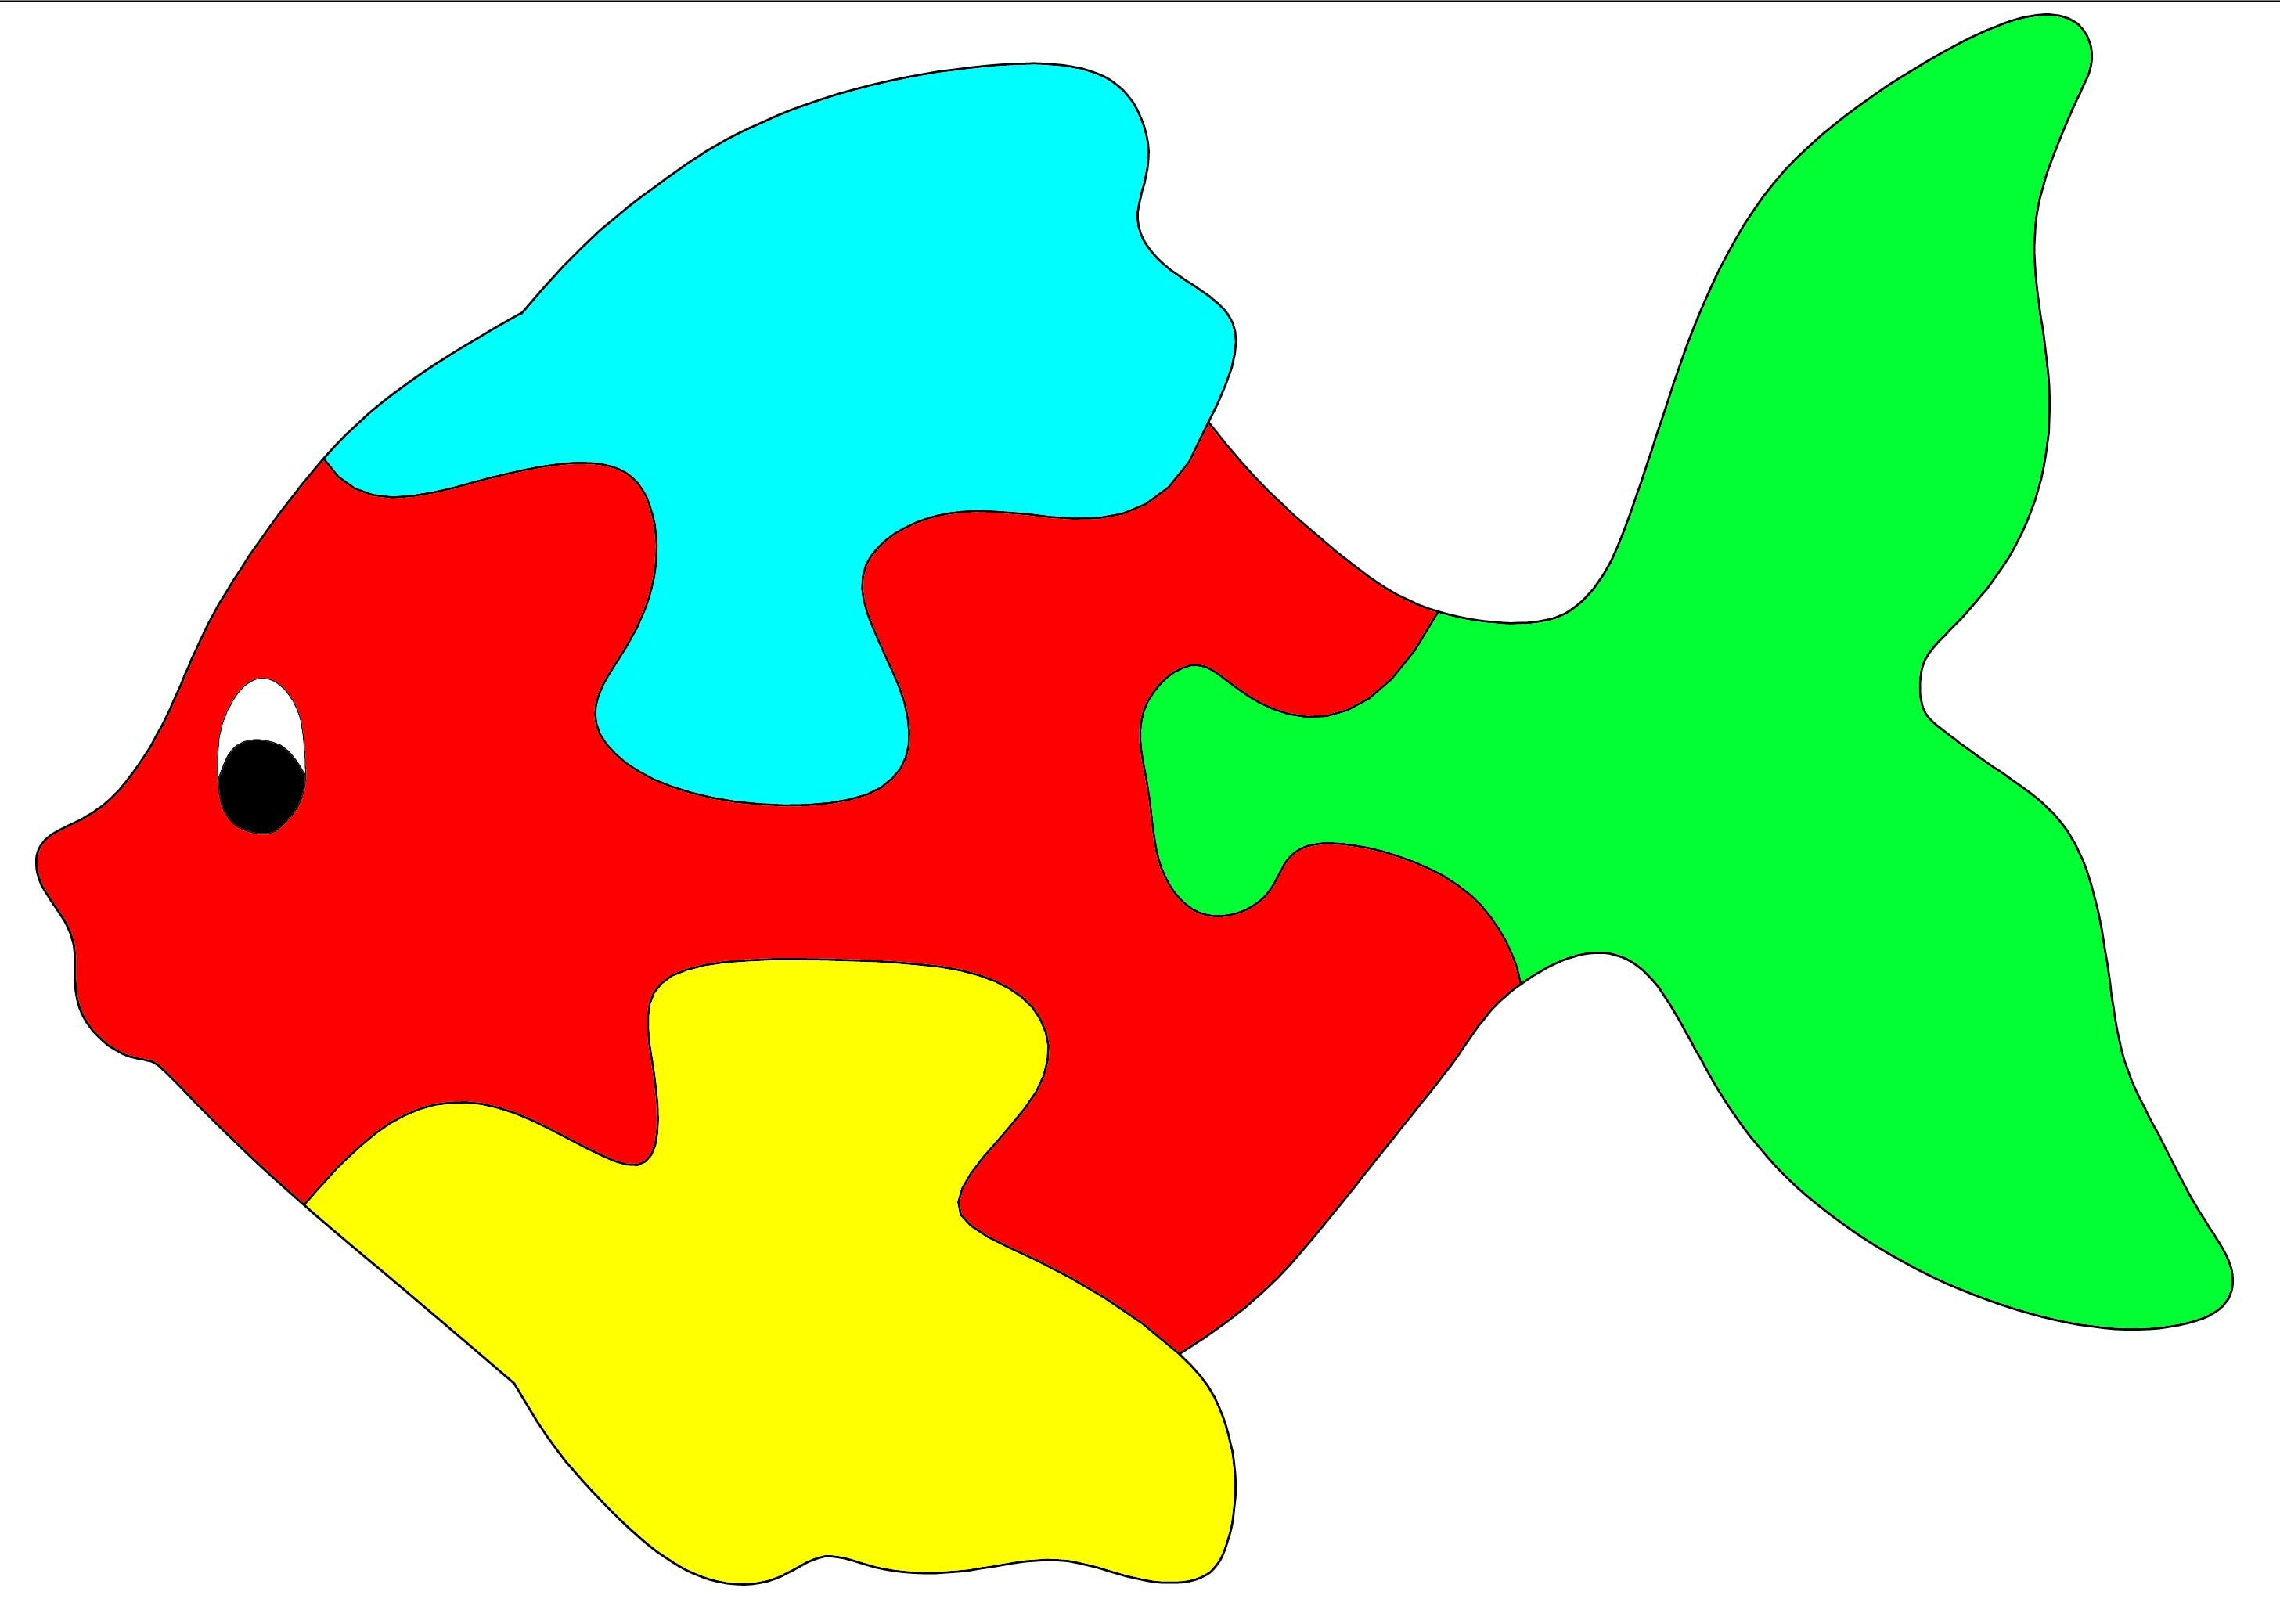 Free Puzzle Card Templates   puzle   Pinterest   Card templates ...